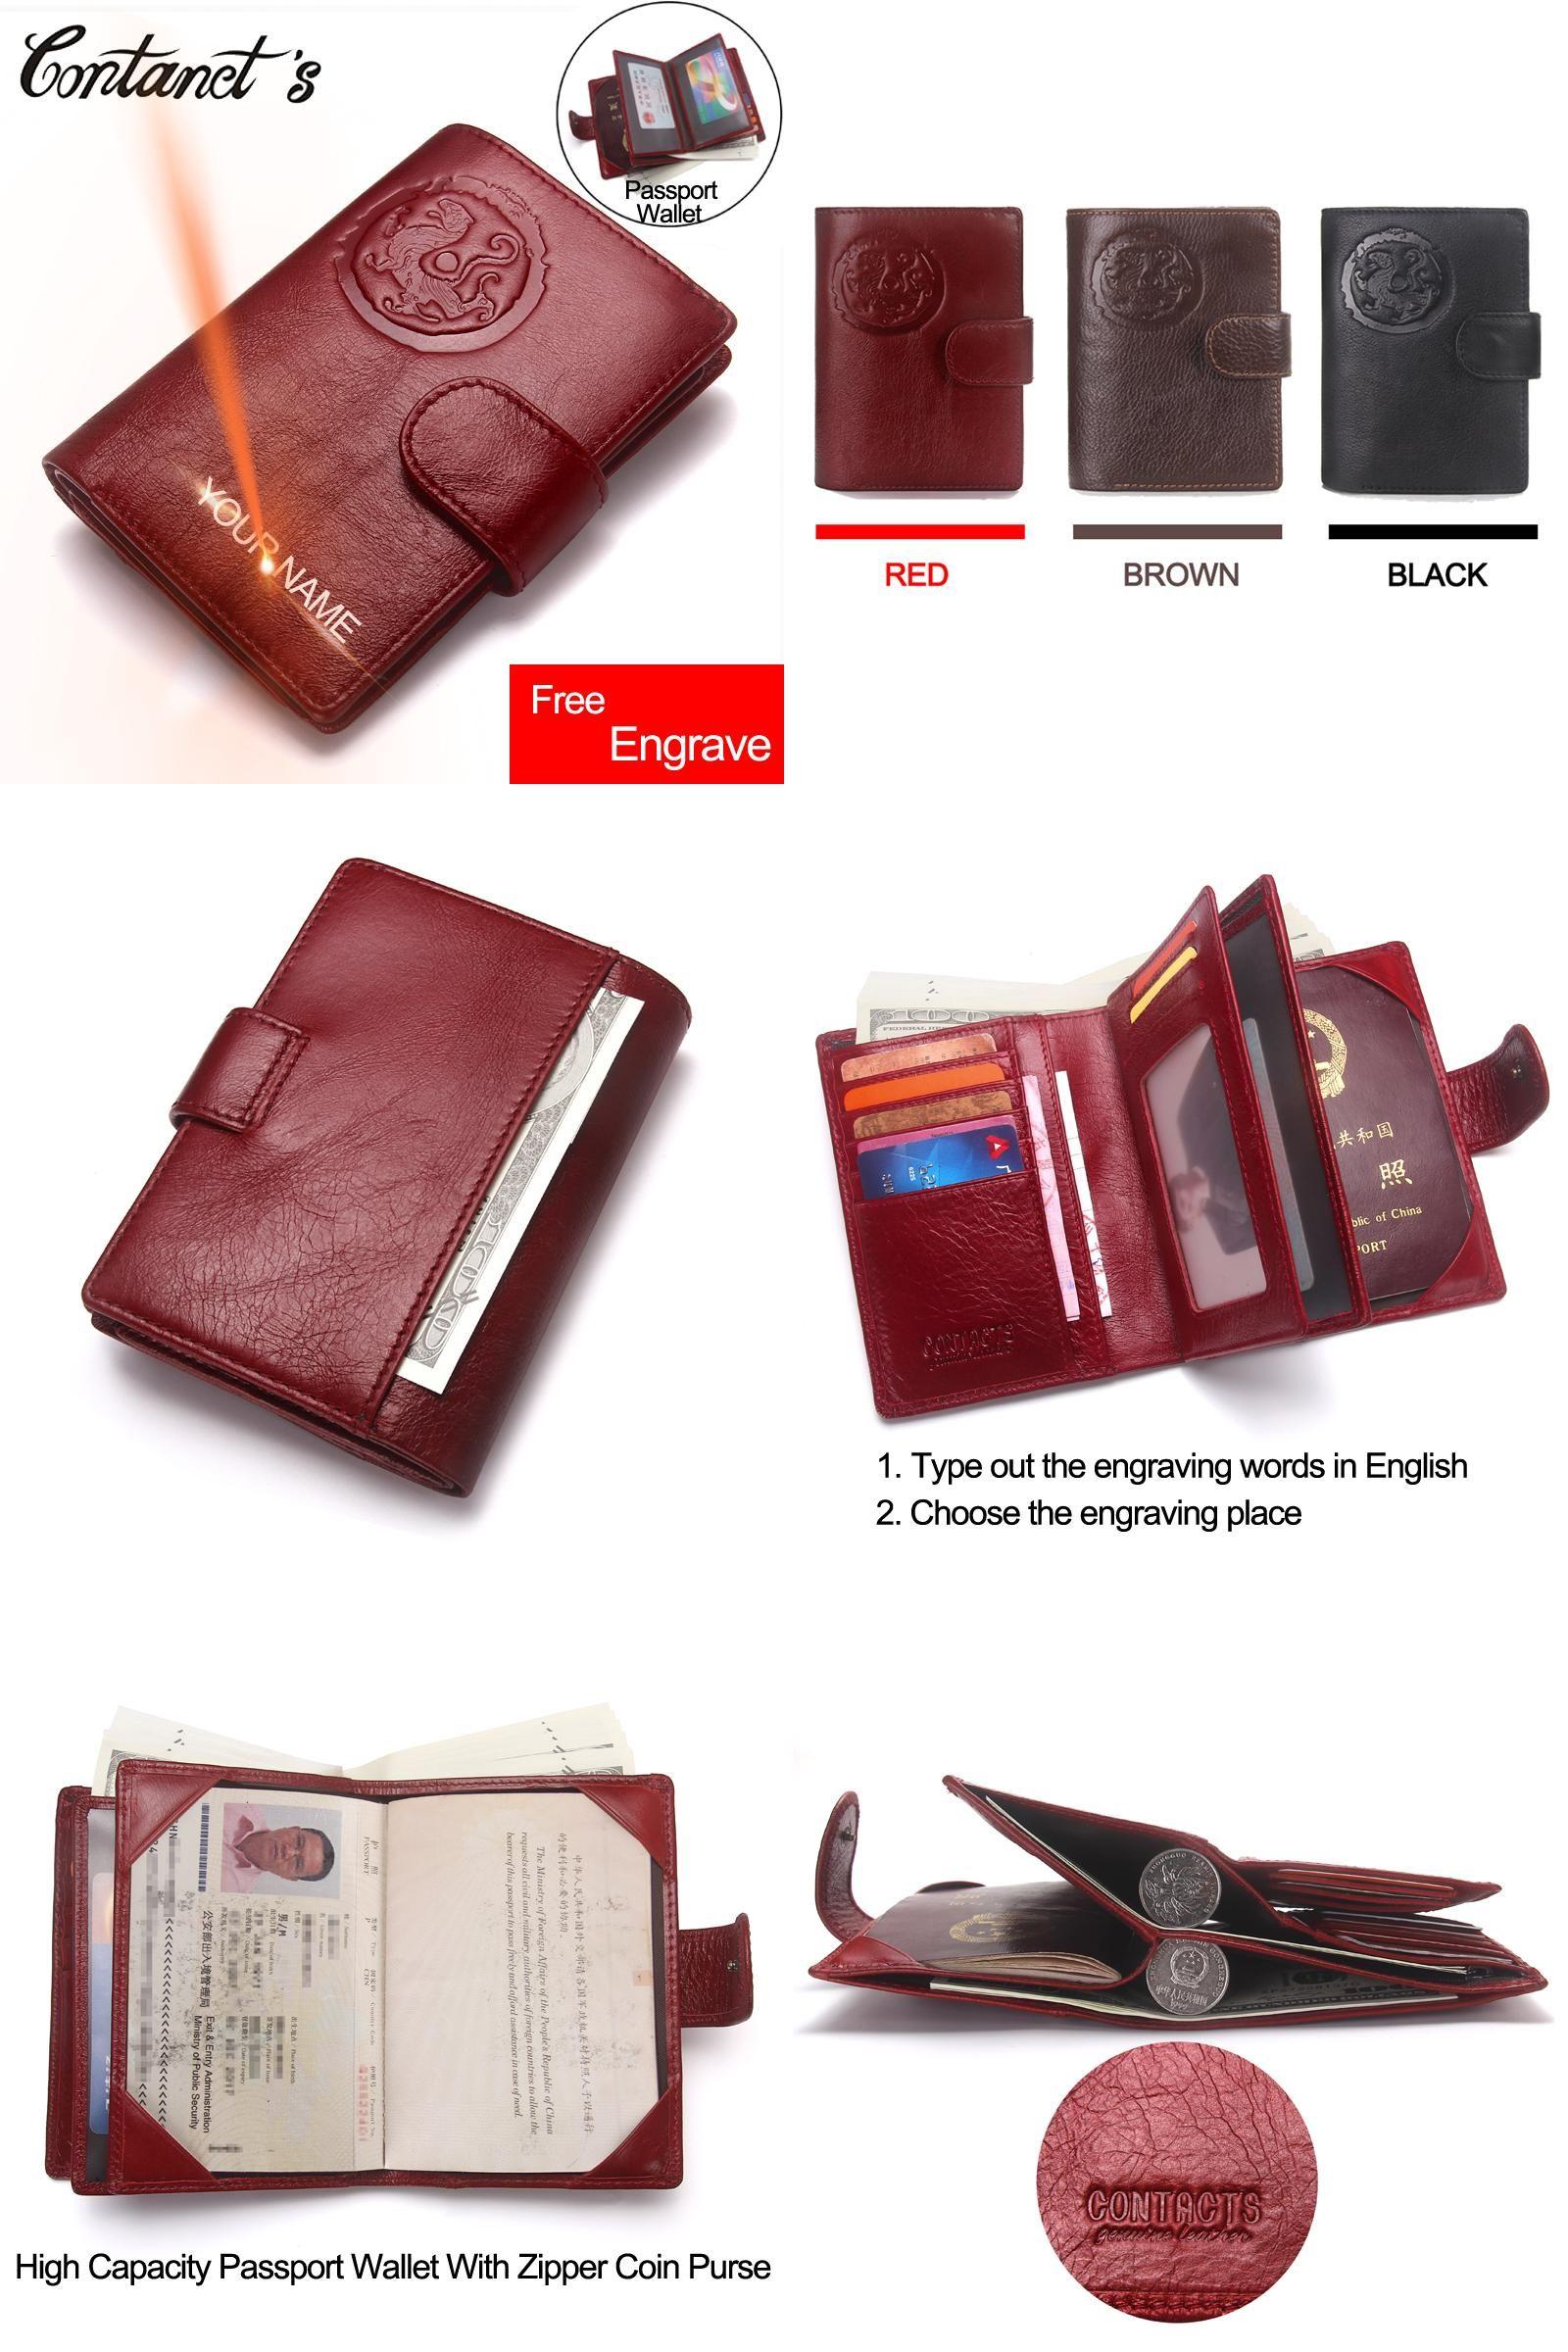 Visit to Buy] Passport Wallet Genuine Leather Women Travel Wallets ...